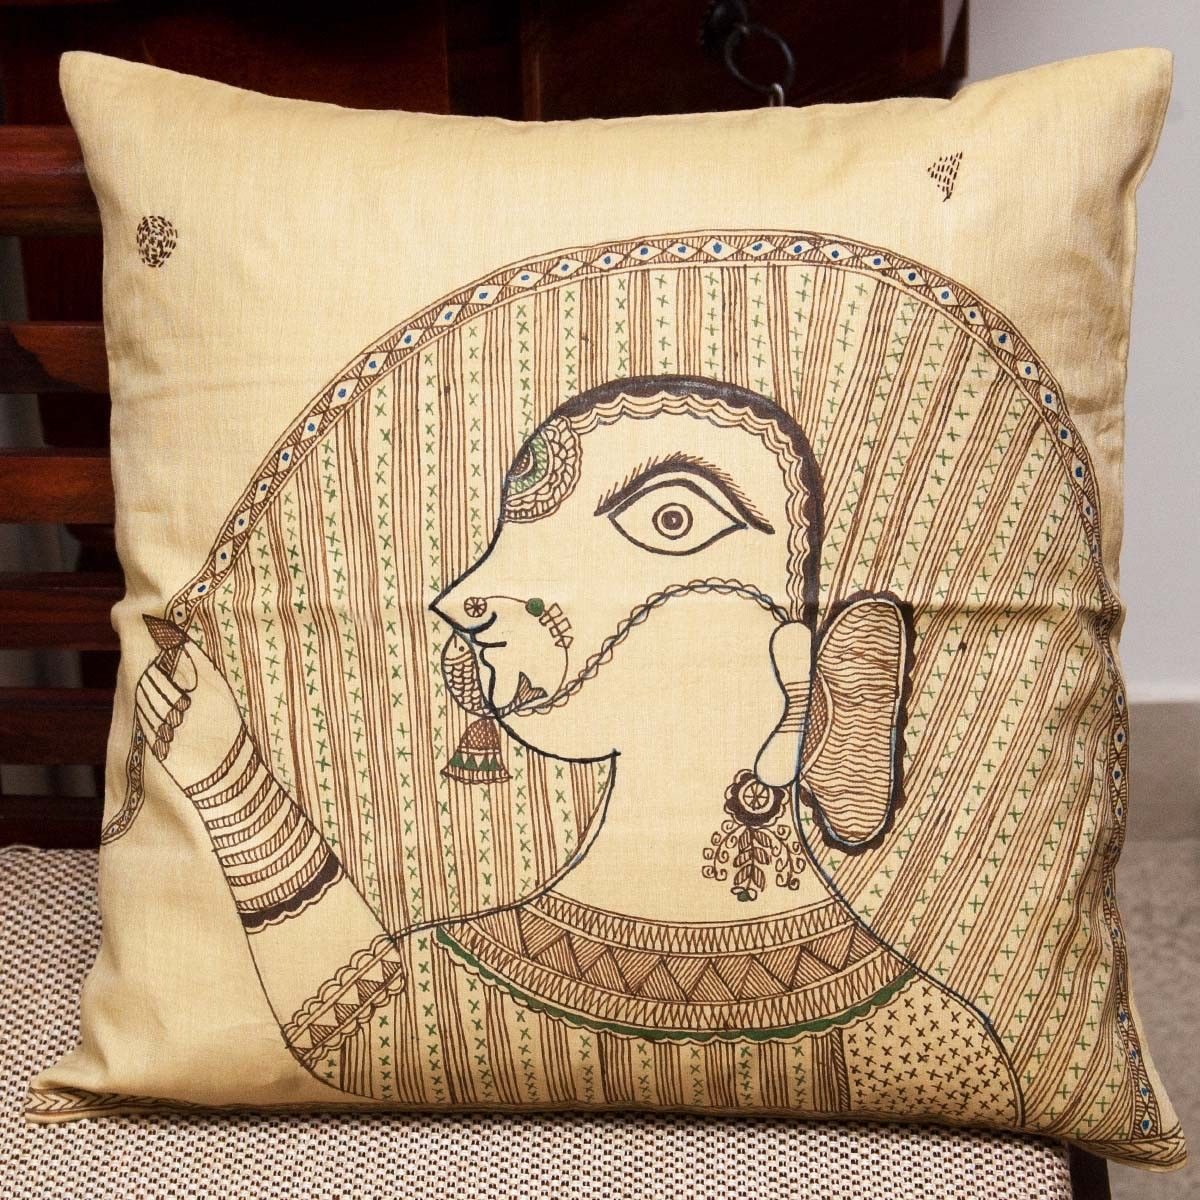 Virgo Zodiac Sign Cushion Cover - 16 X 16 Inch